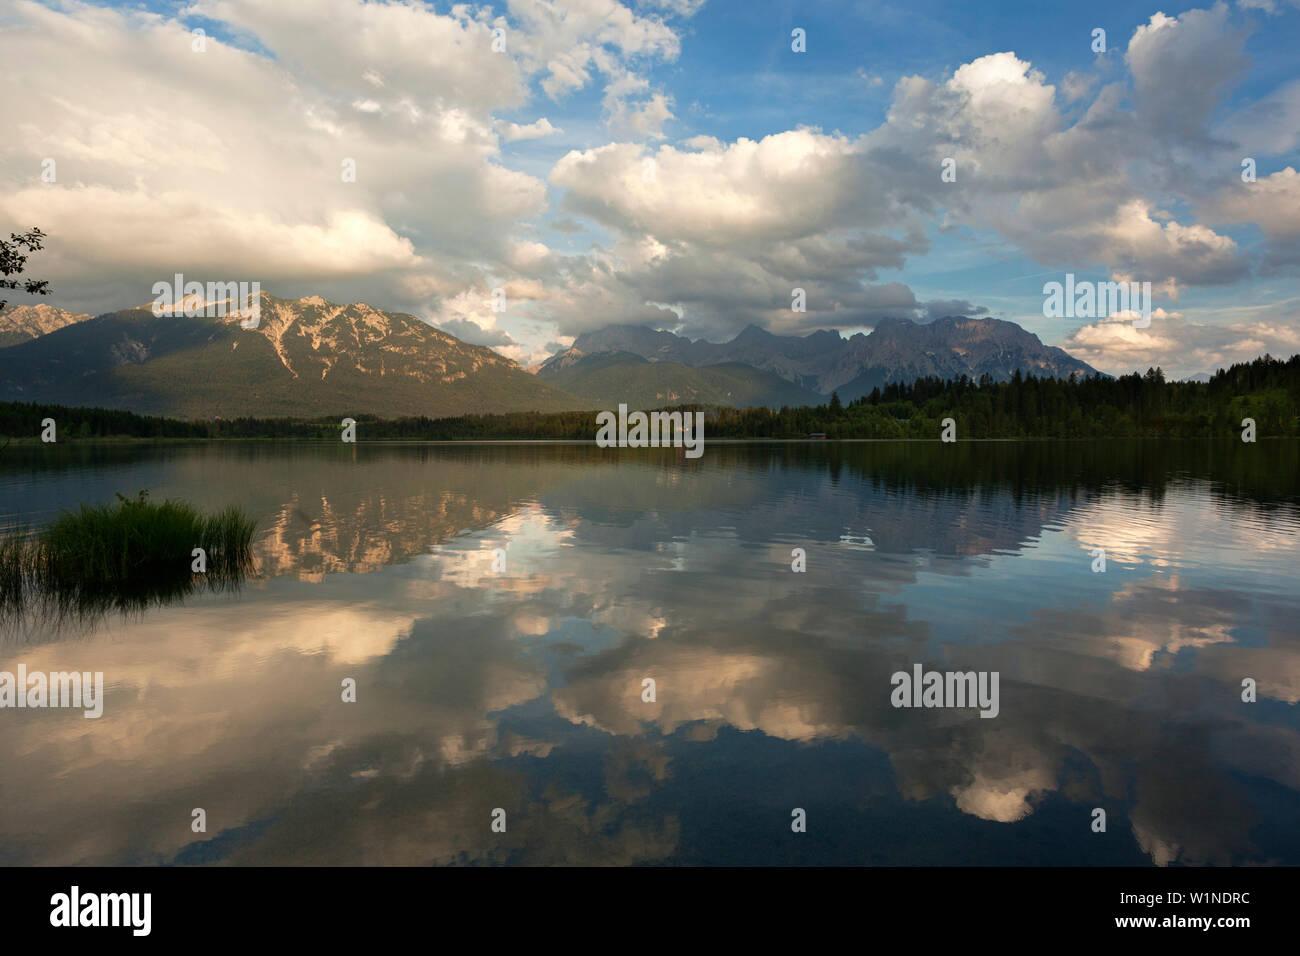 Barmsee, view to Soierngruppe and Karwendel, Werdenfels region, Bavaria, Germany - Stock Image